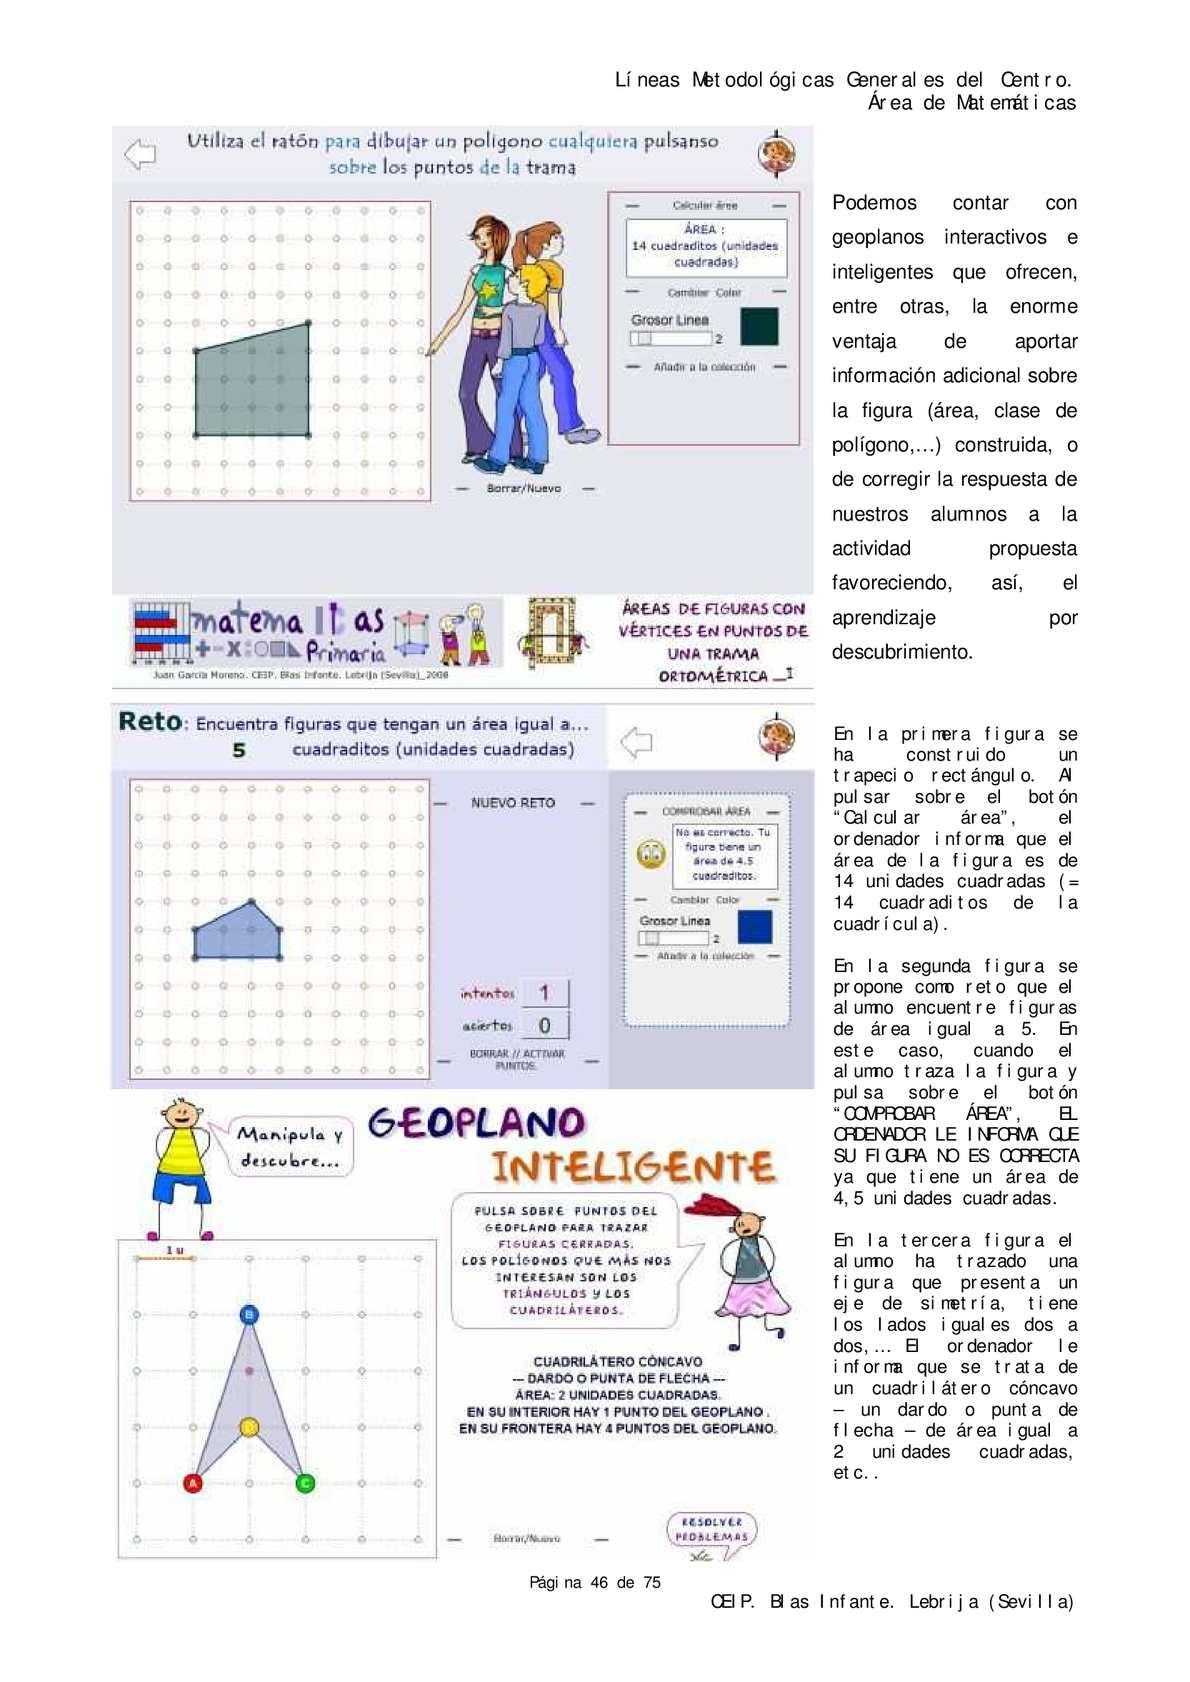 Líneas_metodológicas_centro_matemáticas - CALAMEO Downloader